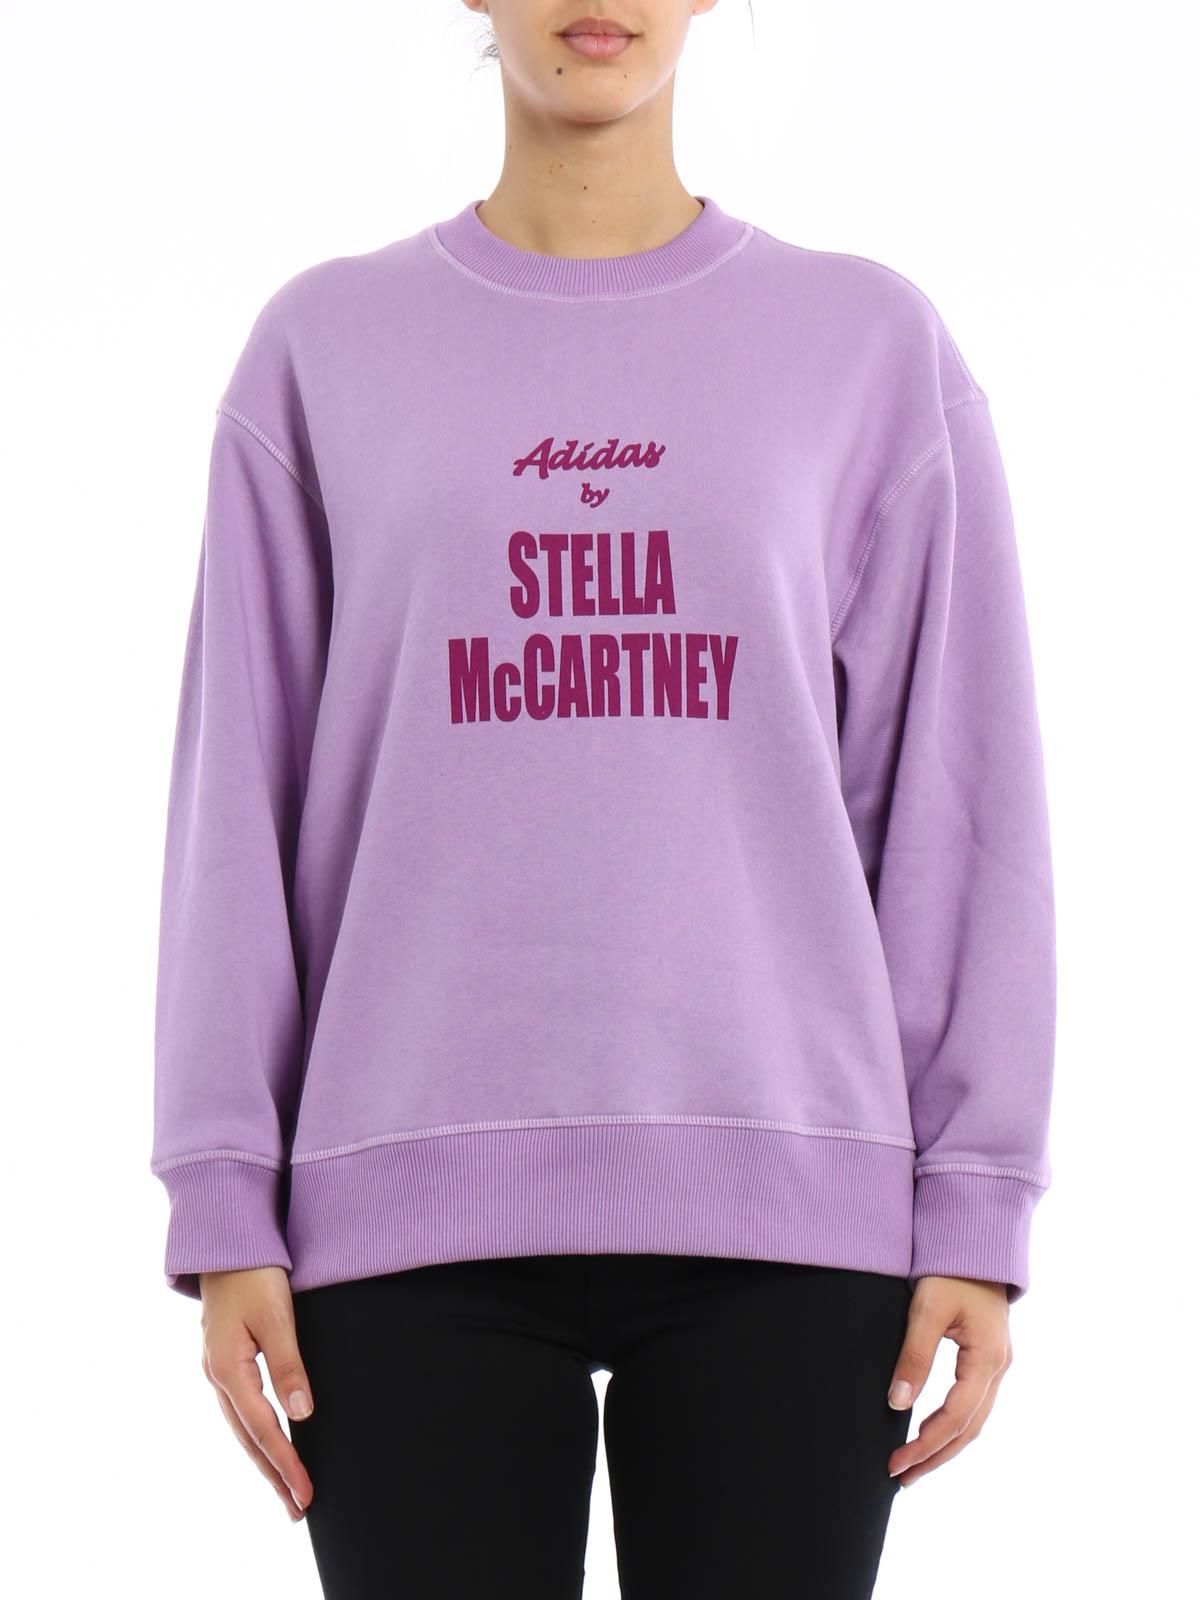 Adidas Over Mccartney Print Stella Sweatshirt By Logo rZgCrT